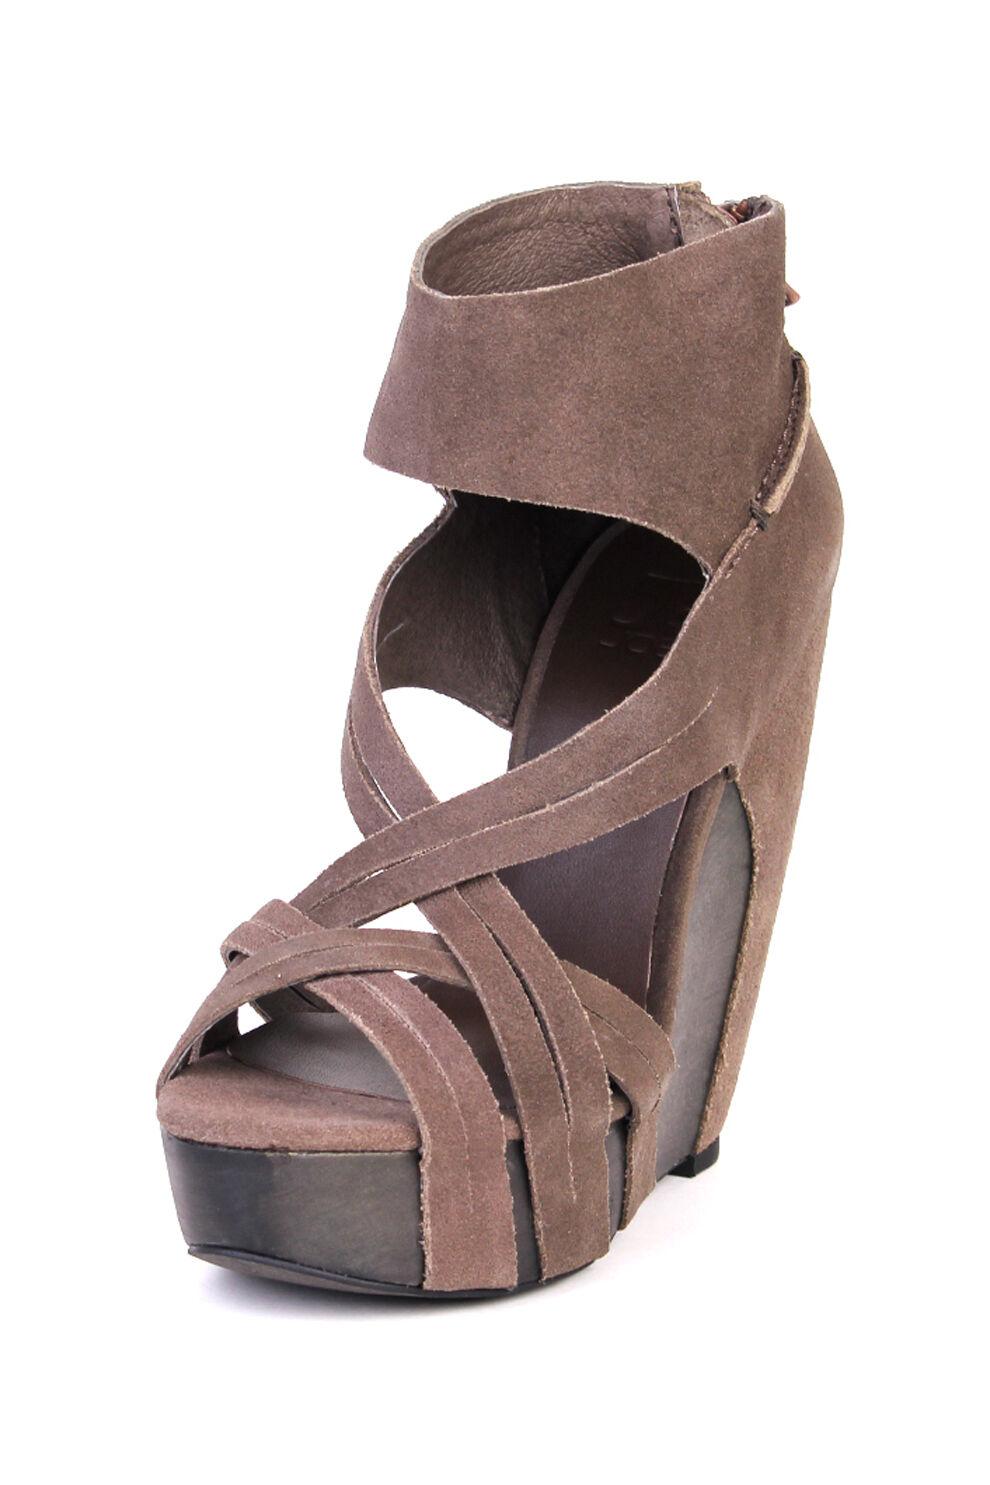 Joe's Jeans Gavin Wedge Sandal Brown $195 Leather Shoes NEW Wrap